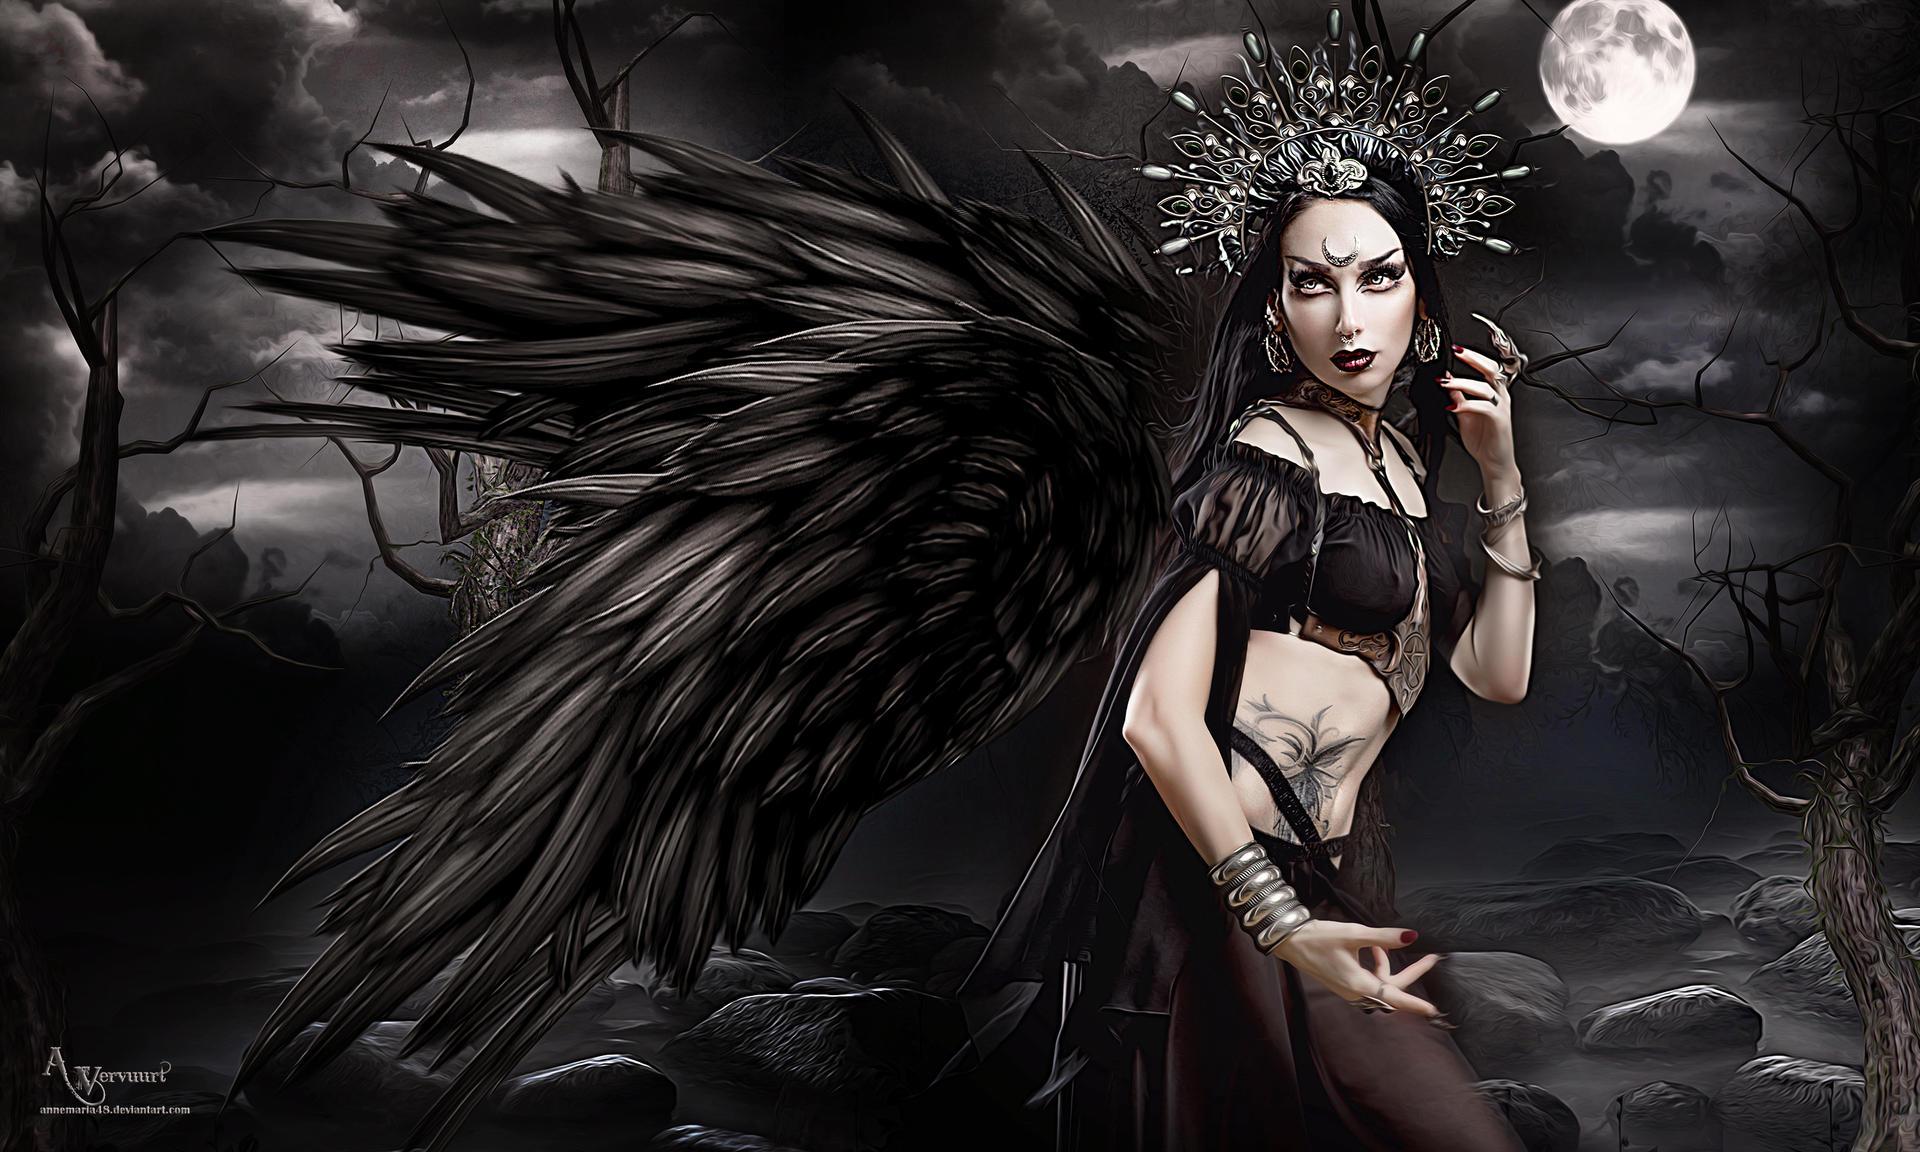 The Angel prinsess